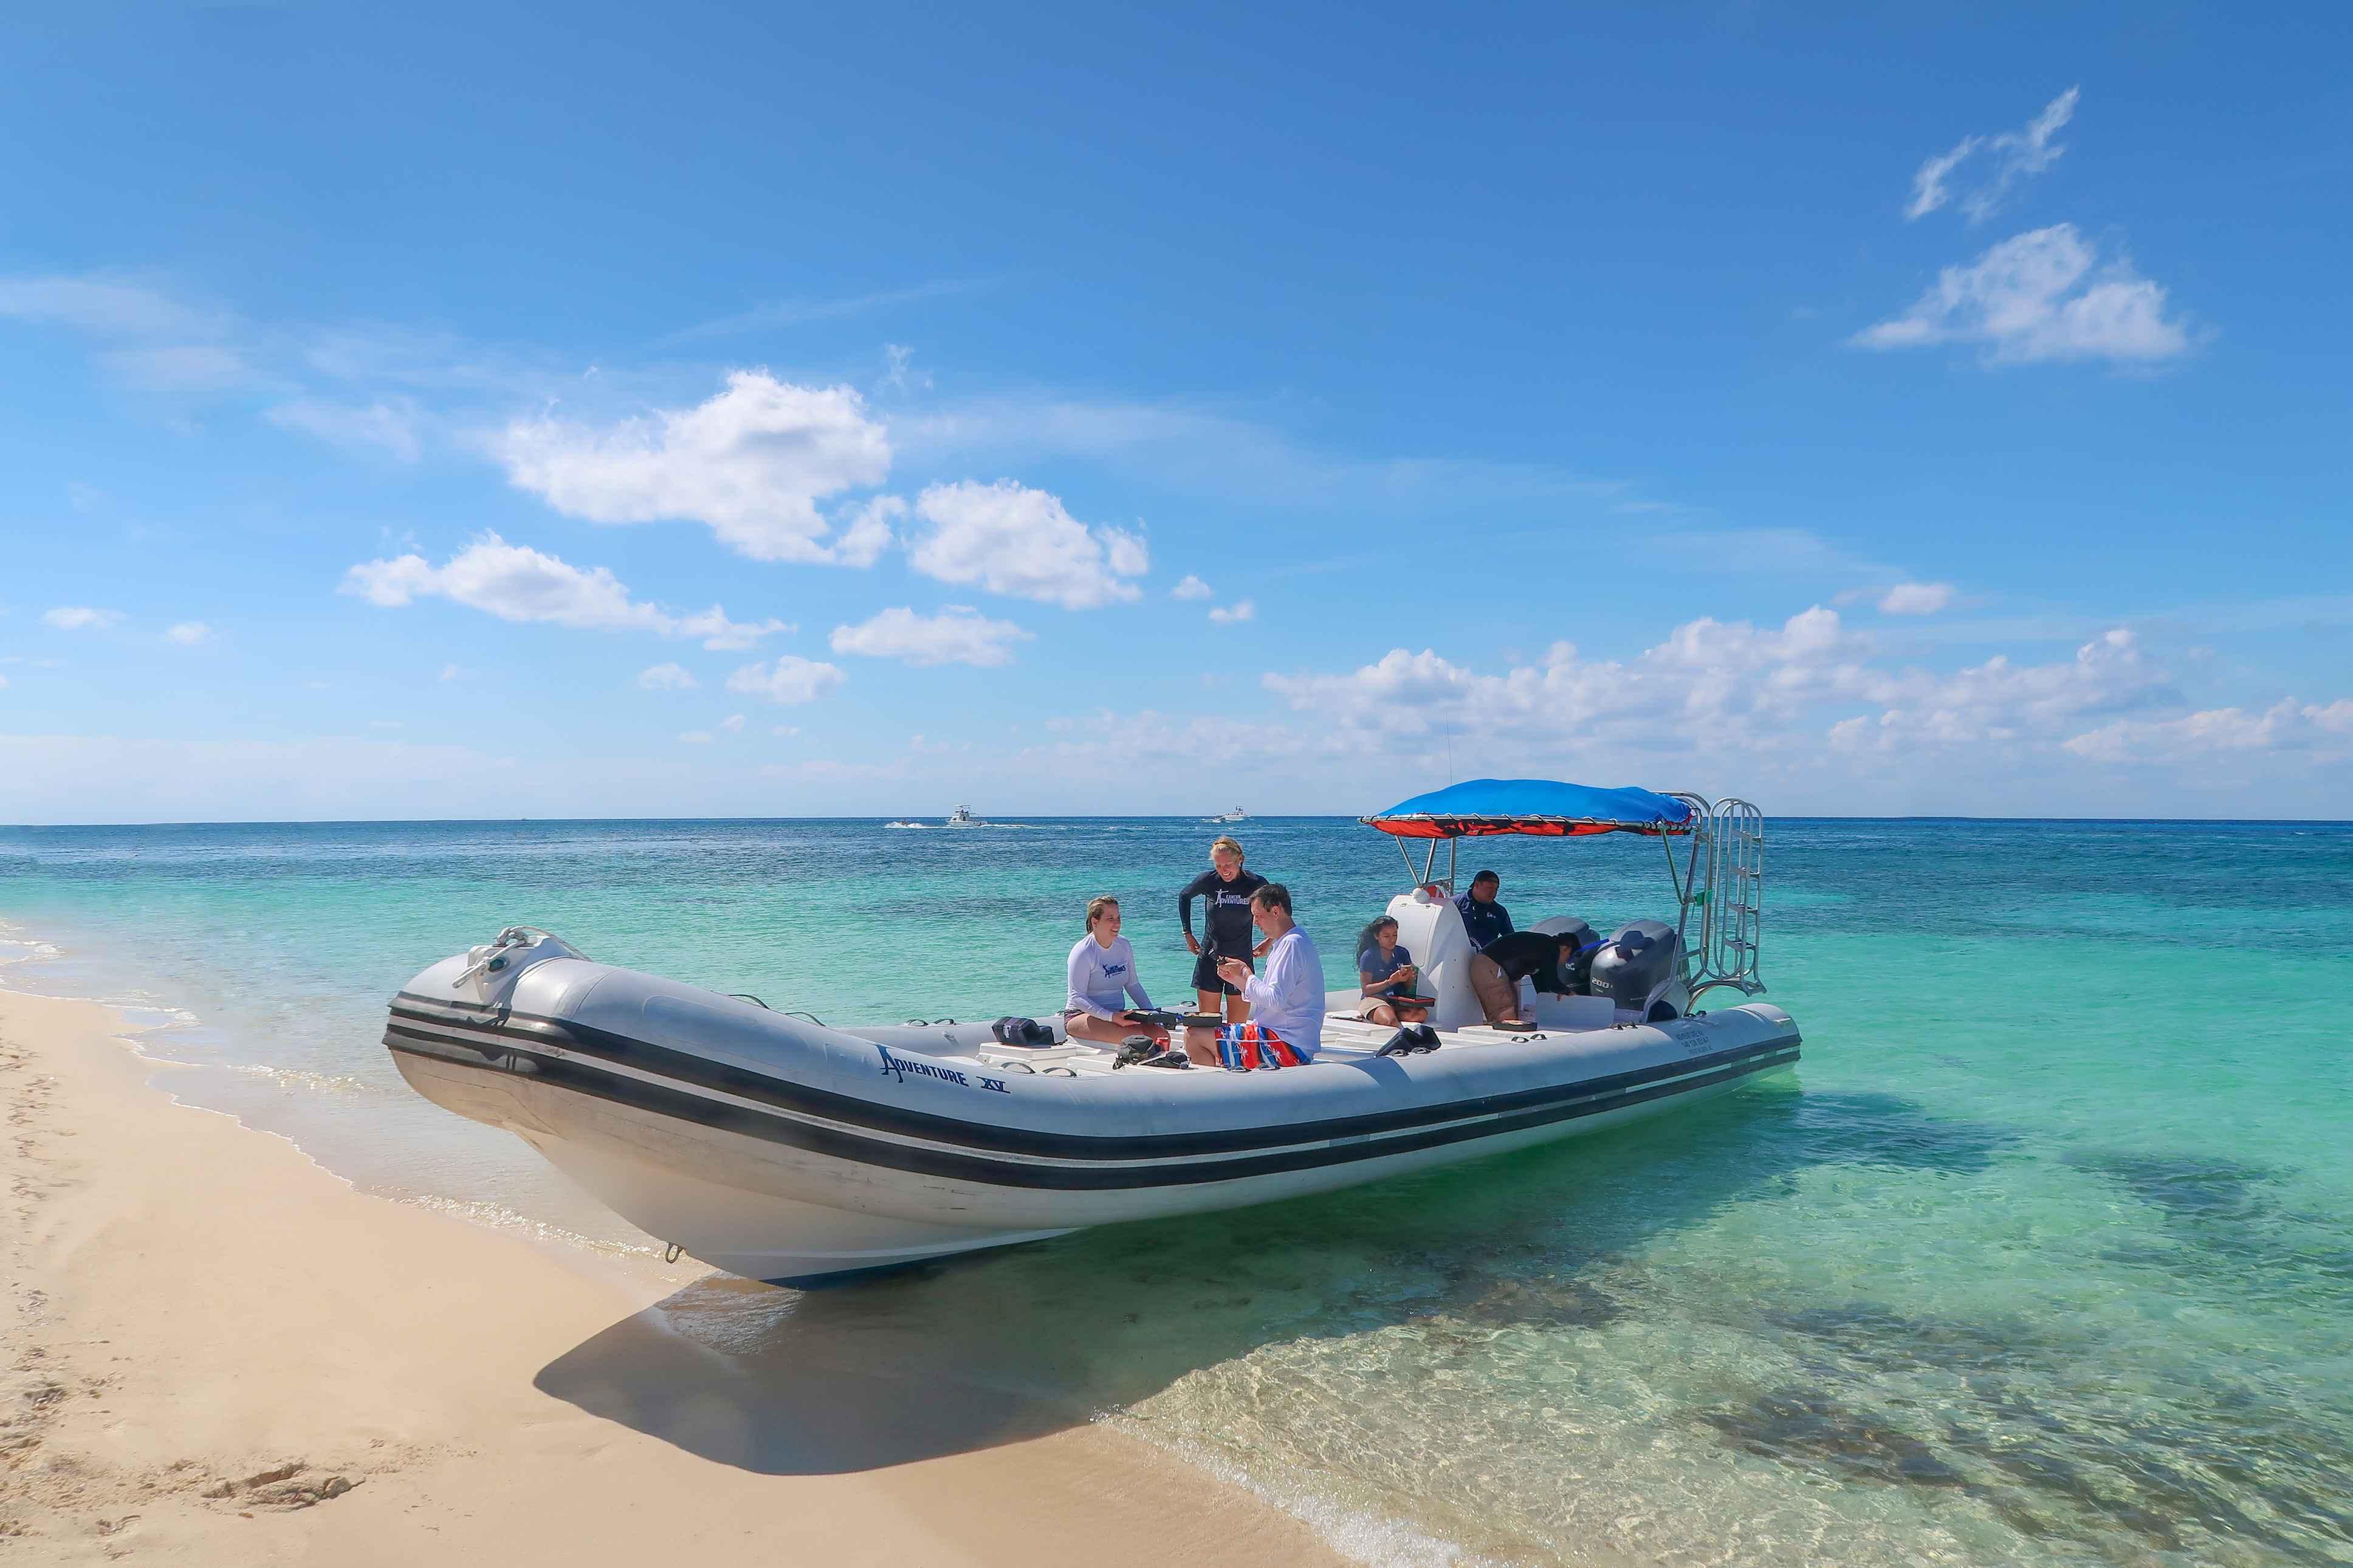 Sea Safari Tour - Last Minute Tours in Cancún and Riviera Maya